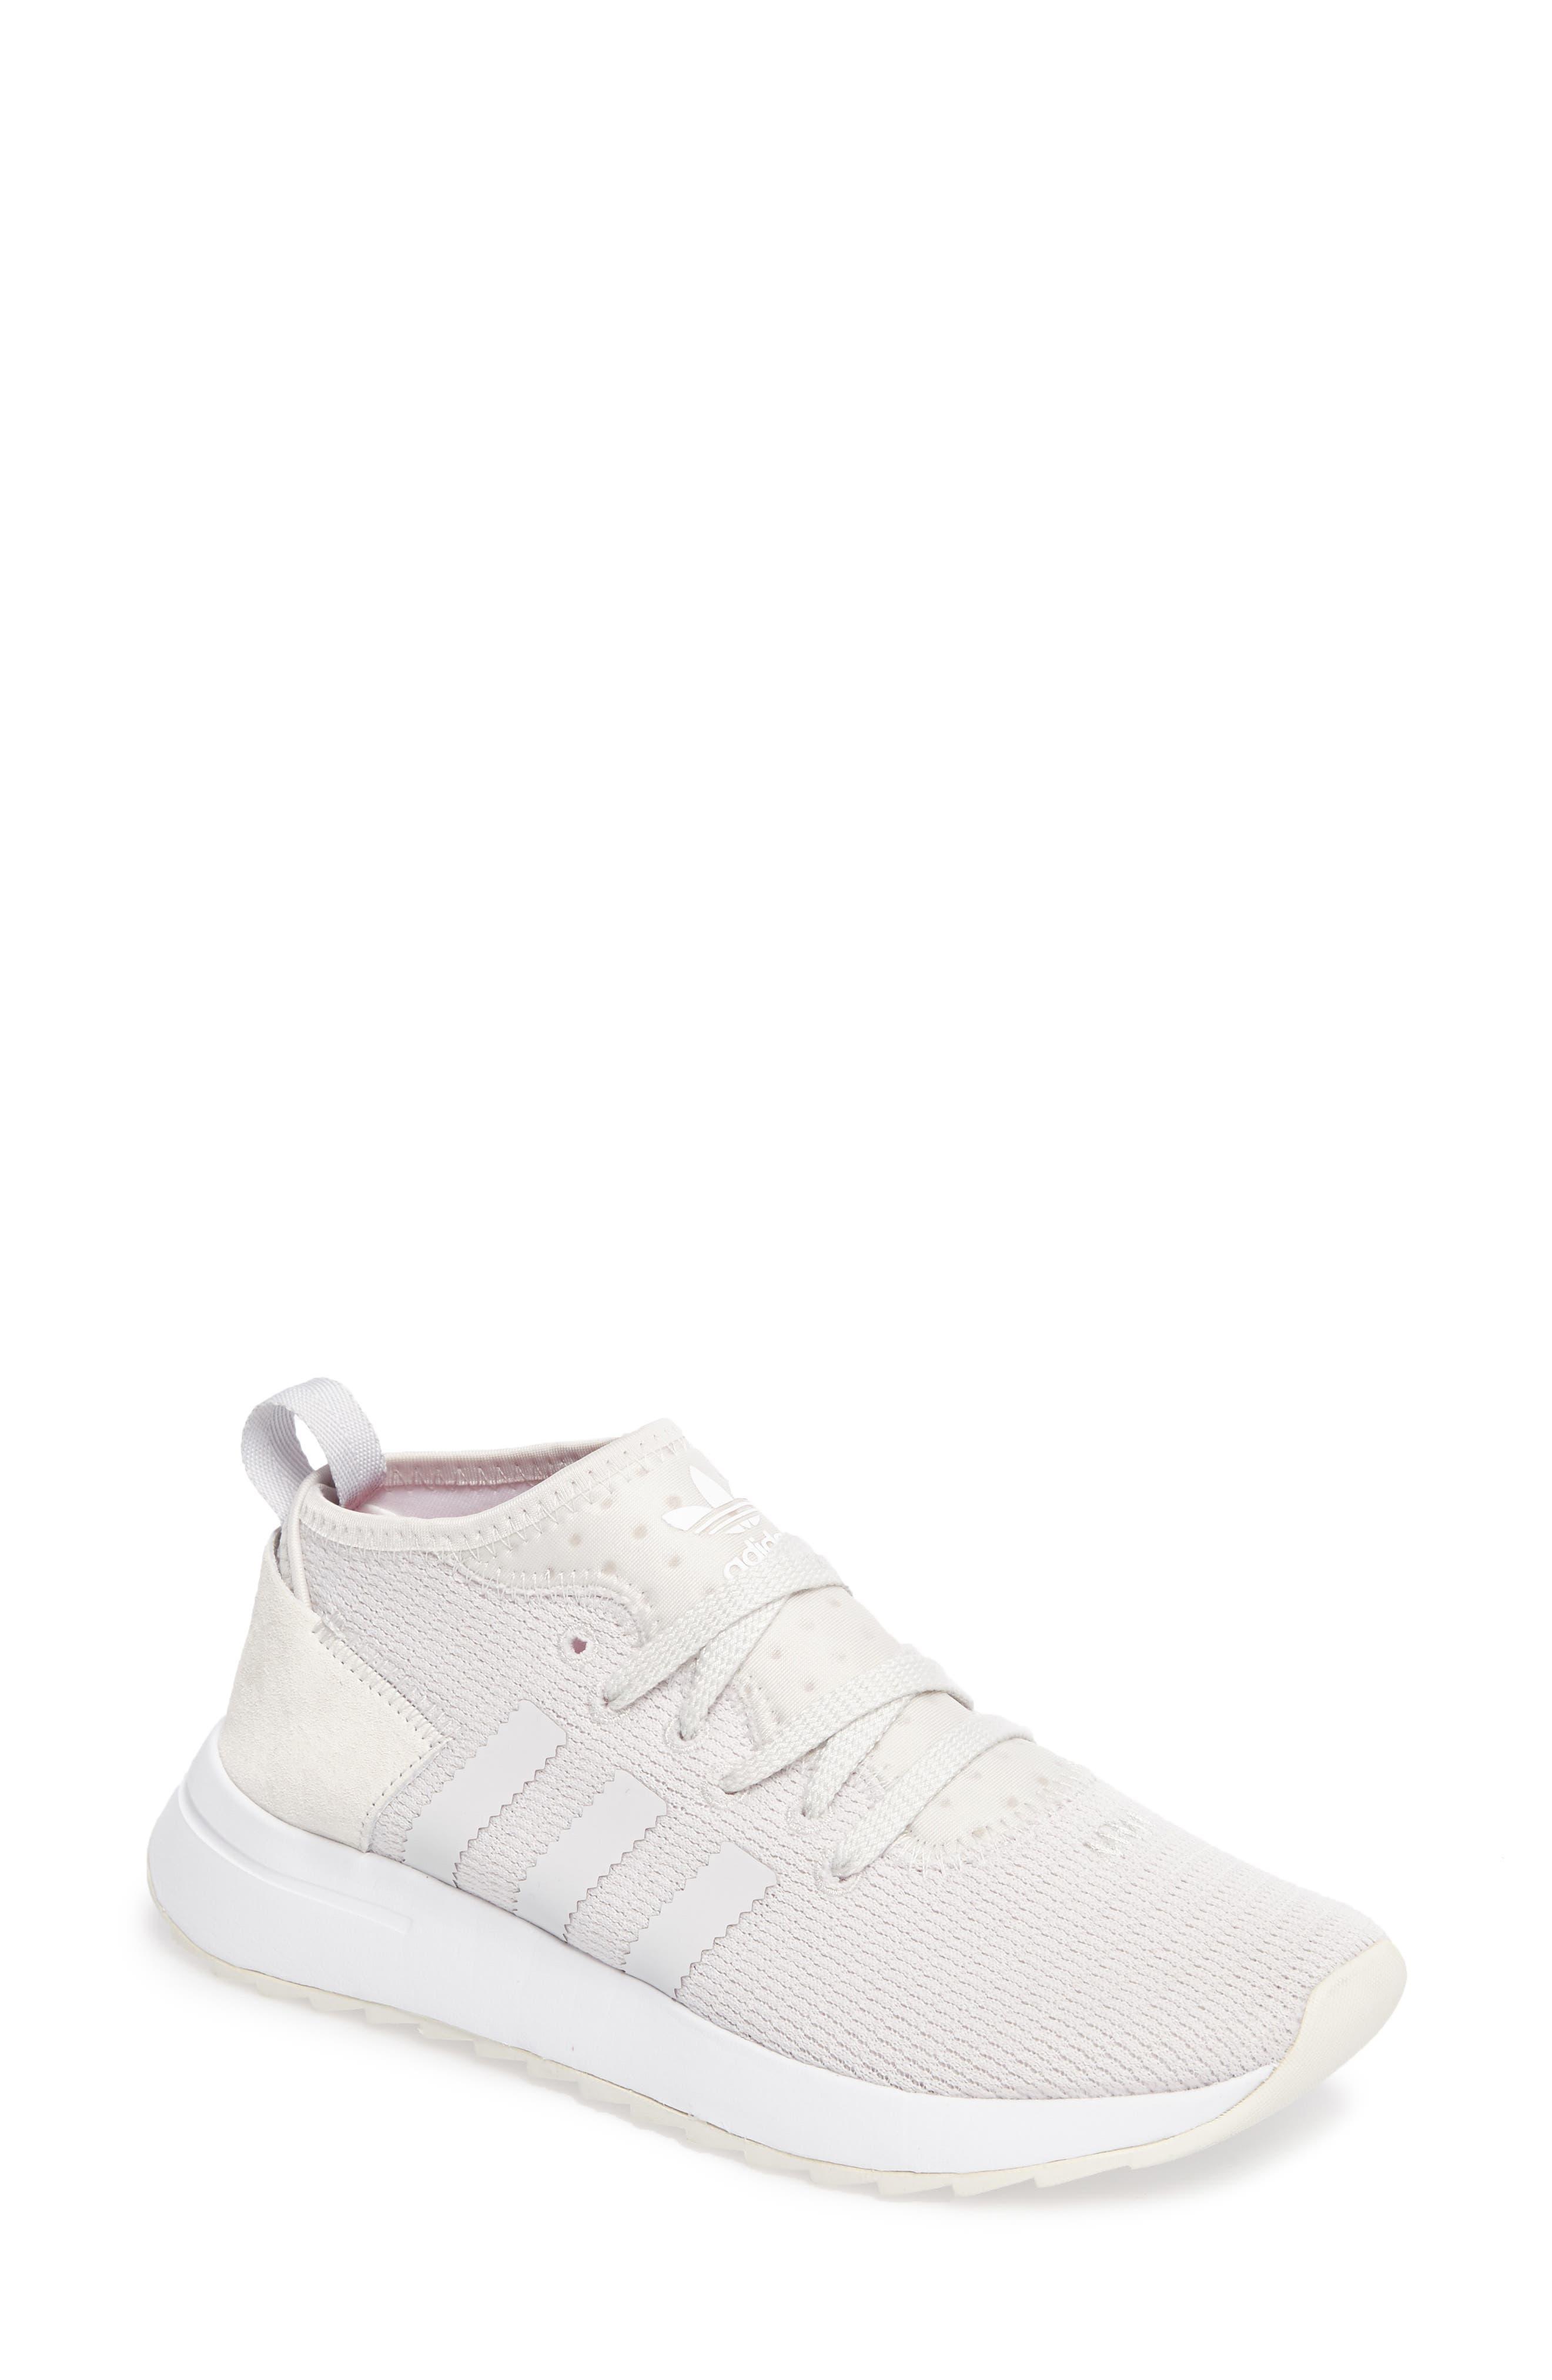 Flashback Winter Sneaker,                             Main thumbnail 1, color,                             Grey/ White